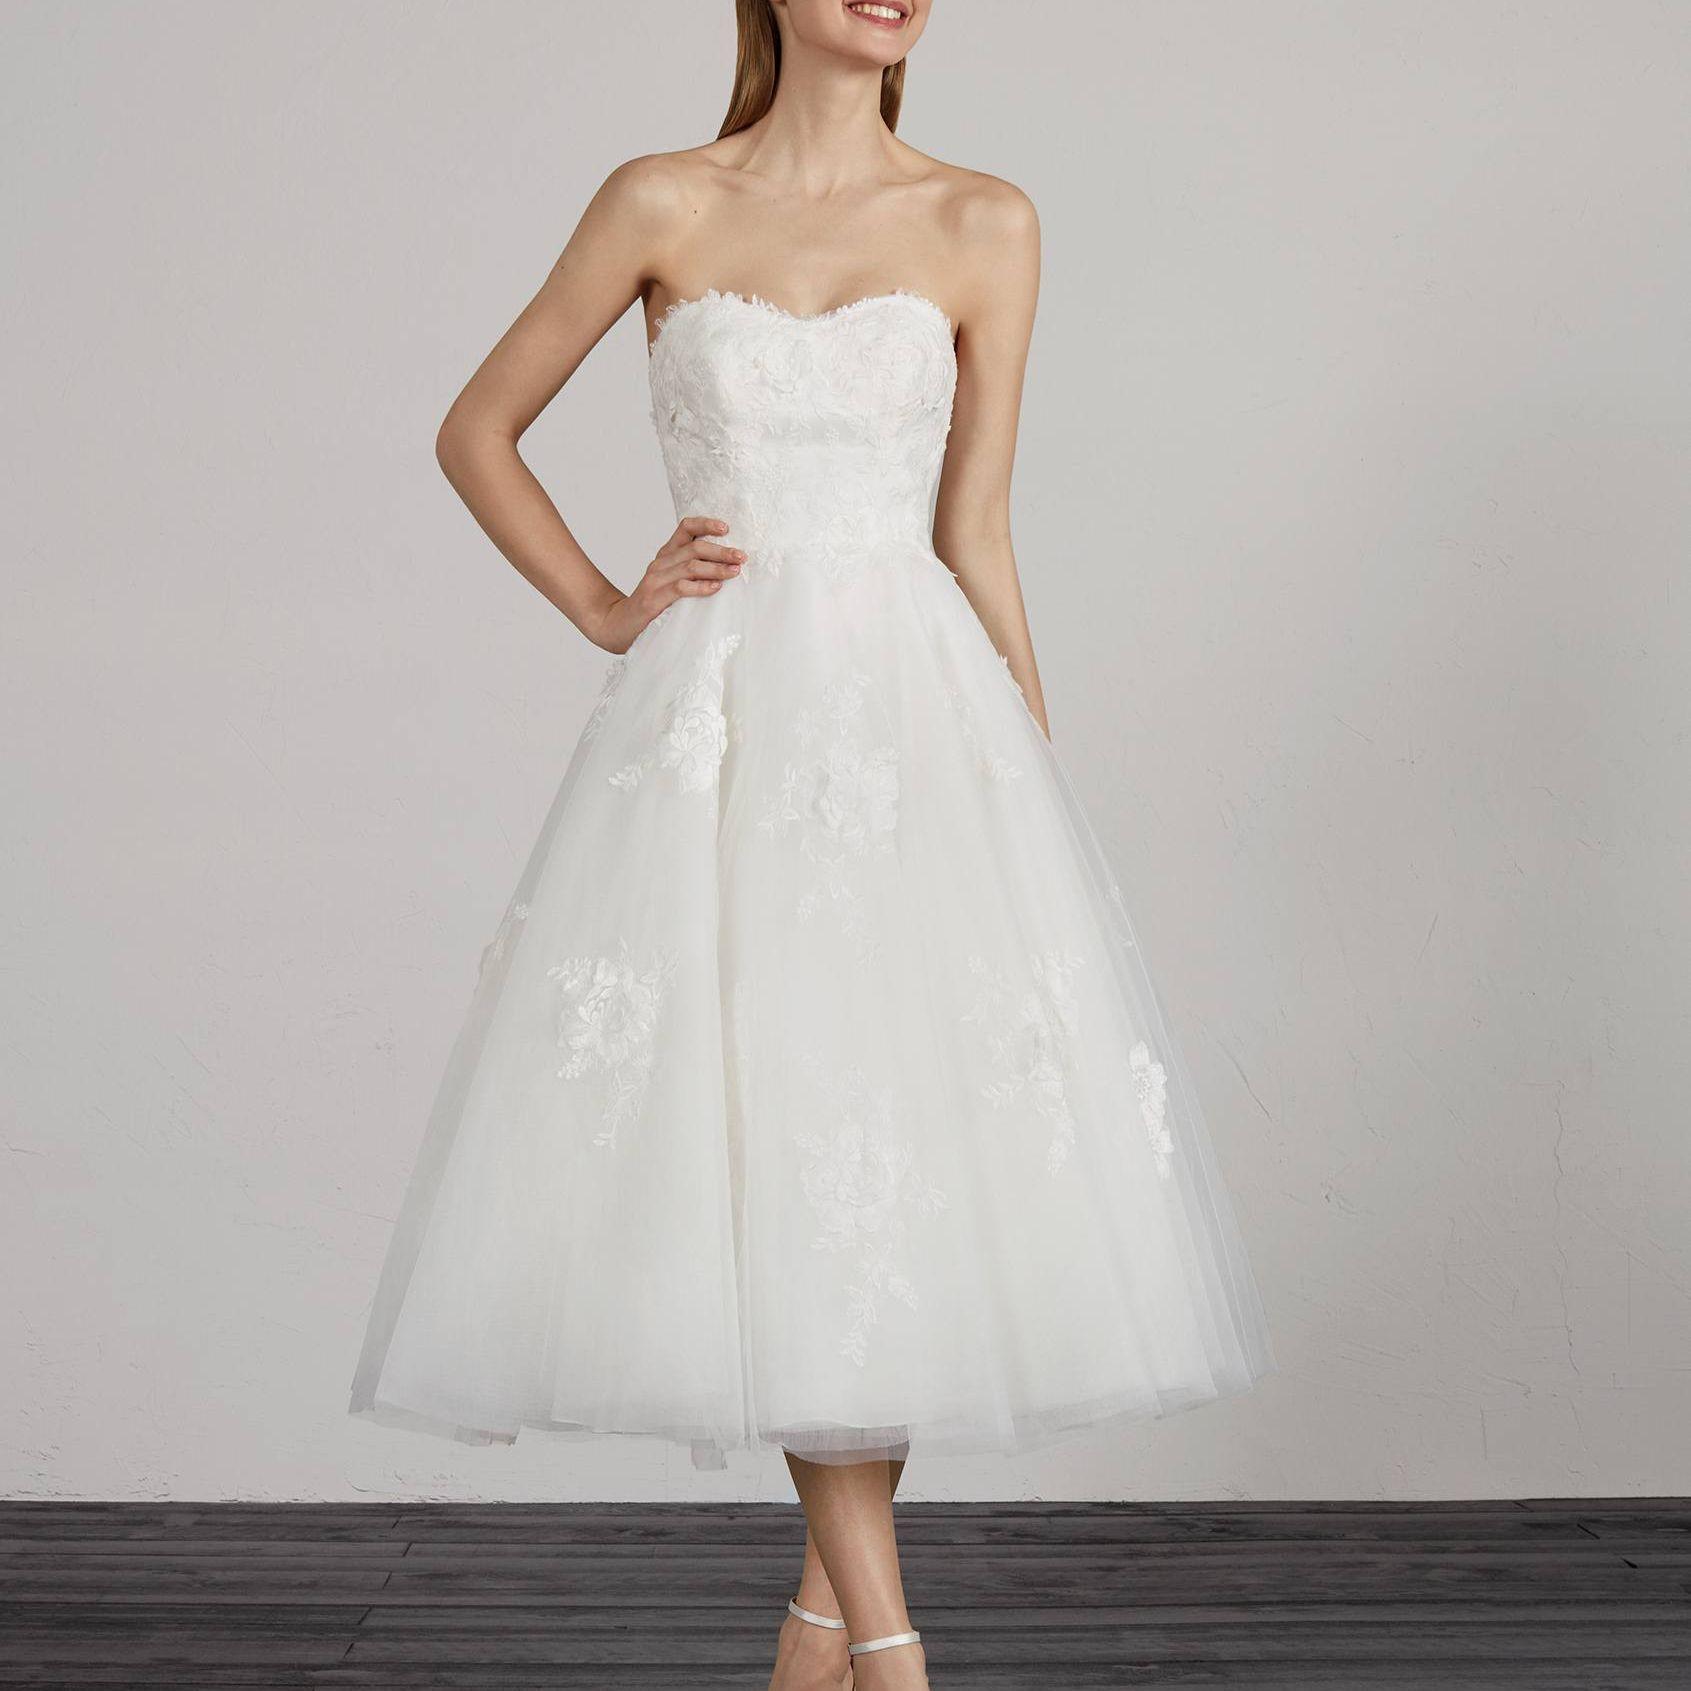 Pronovias Marile Tea Length Wedding Dress, price upon request